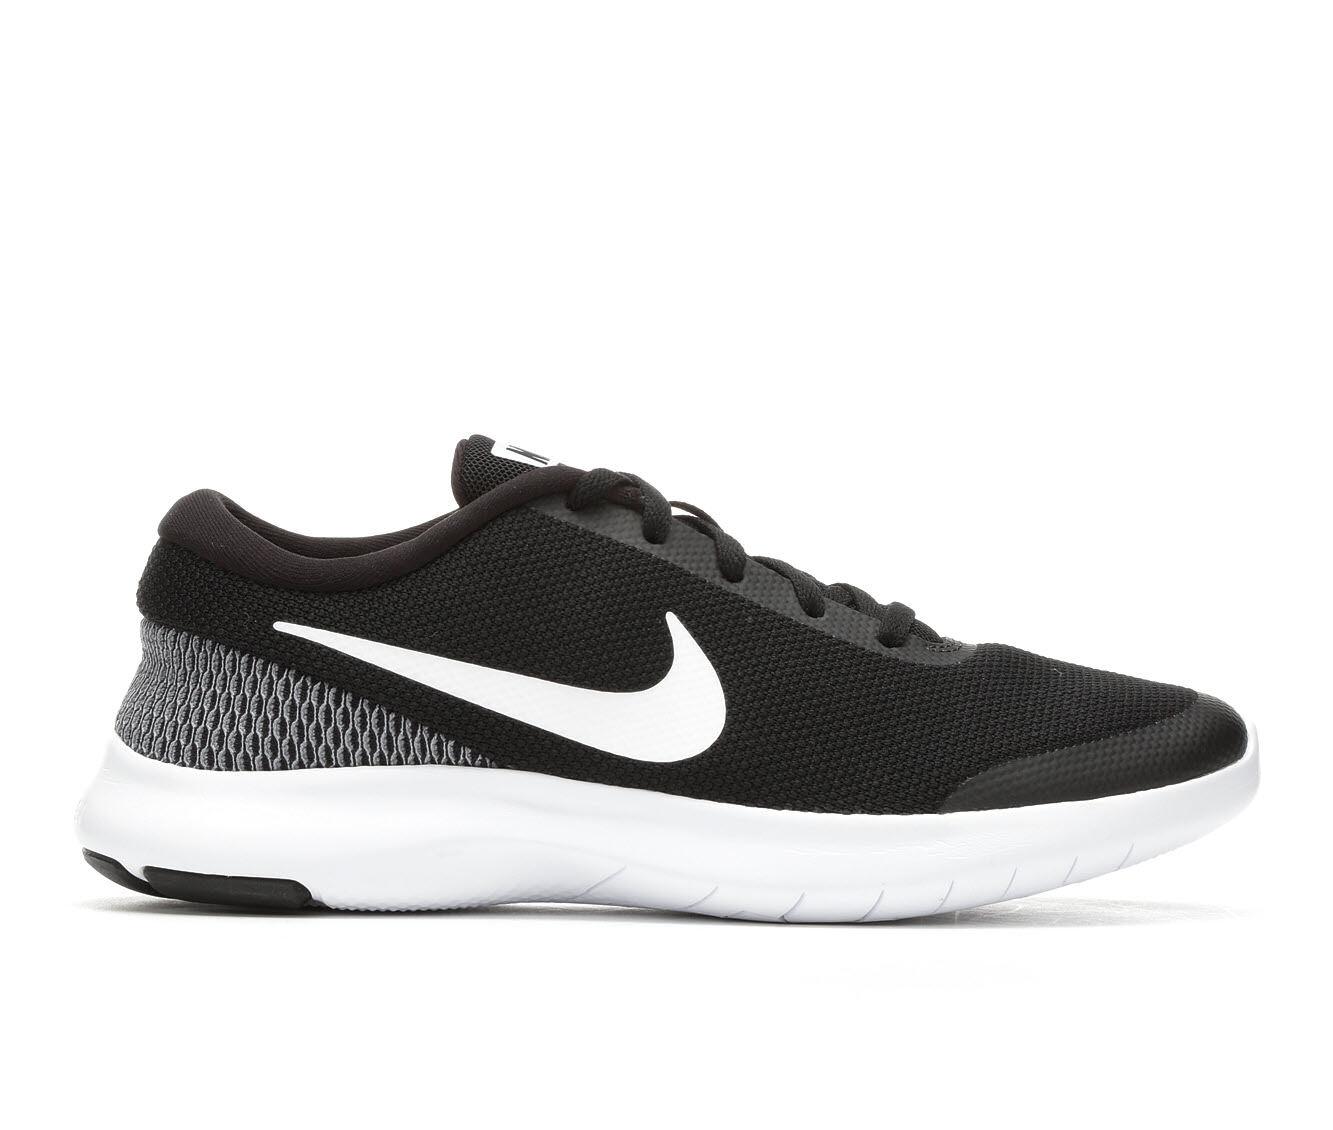 Women's Nike Flex Experience Run 7 Running Shoes Black/White